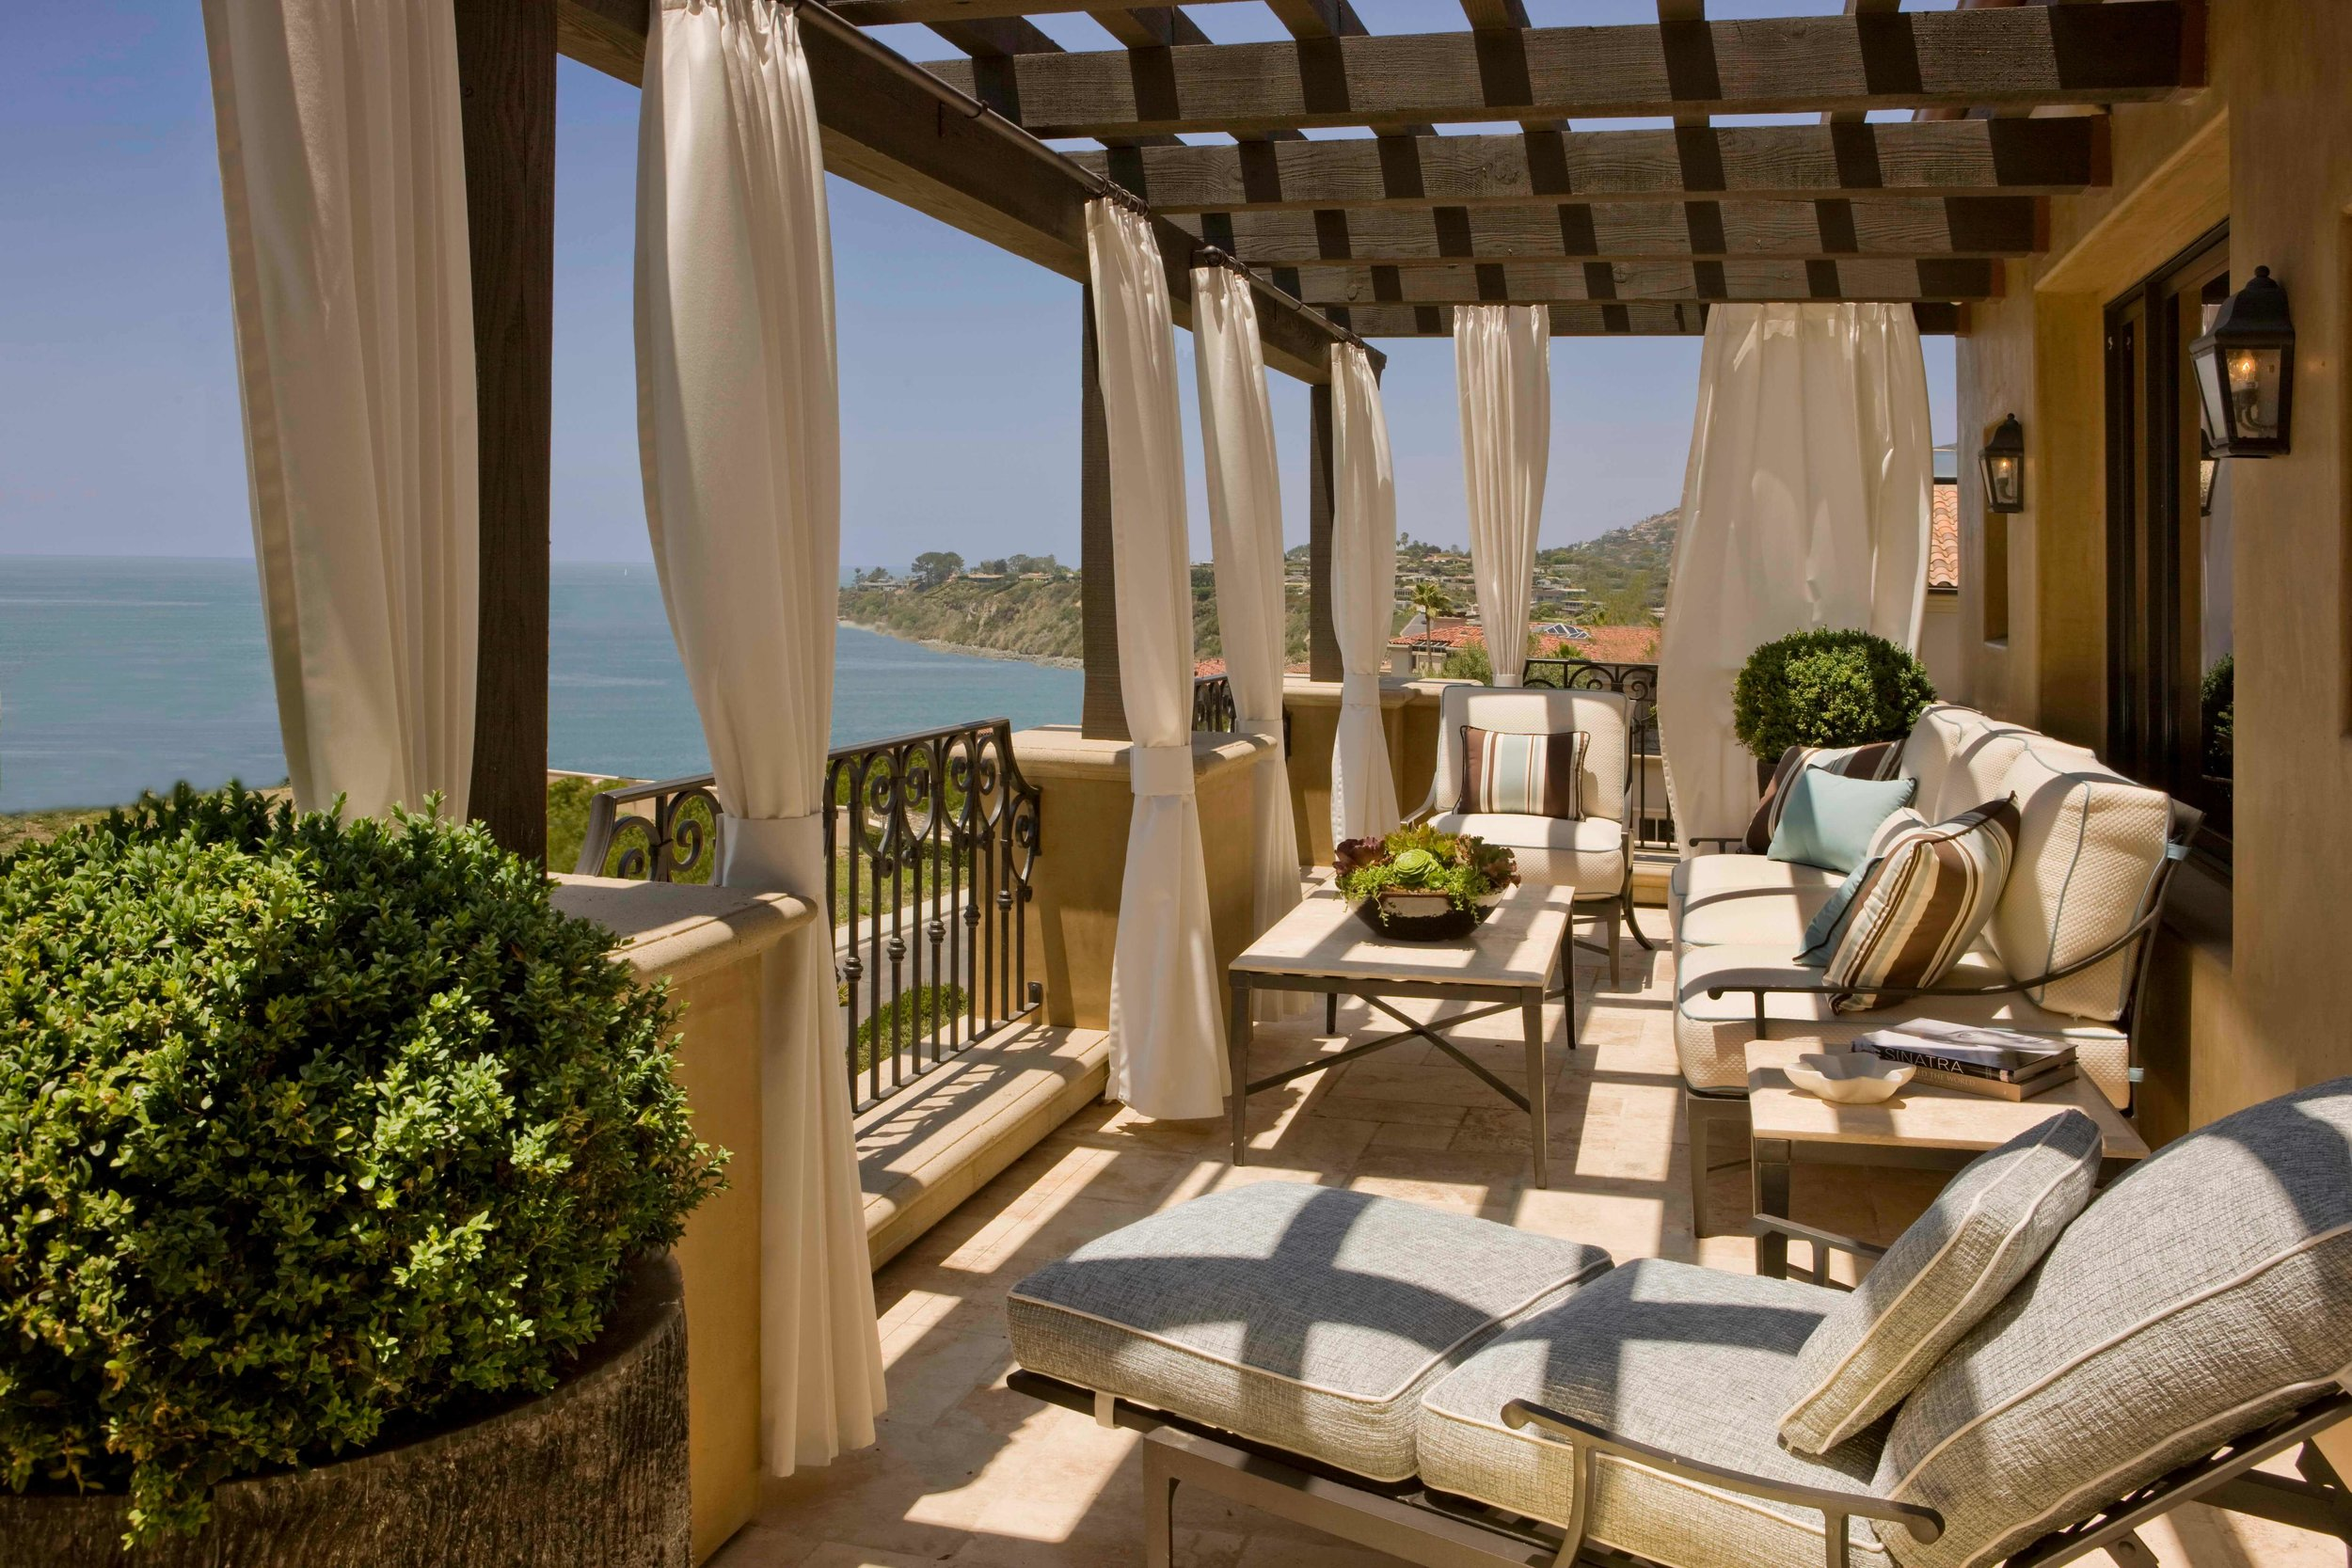 elizabeth-tapper-interiors-ritz-cove-laguna-exterior-outdoor-lounge-oceanfront-deck-view-draped-pergola.jpg